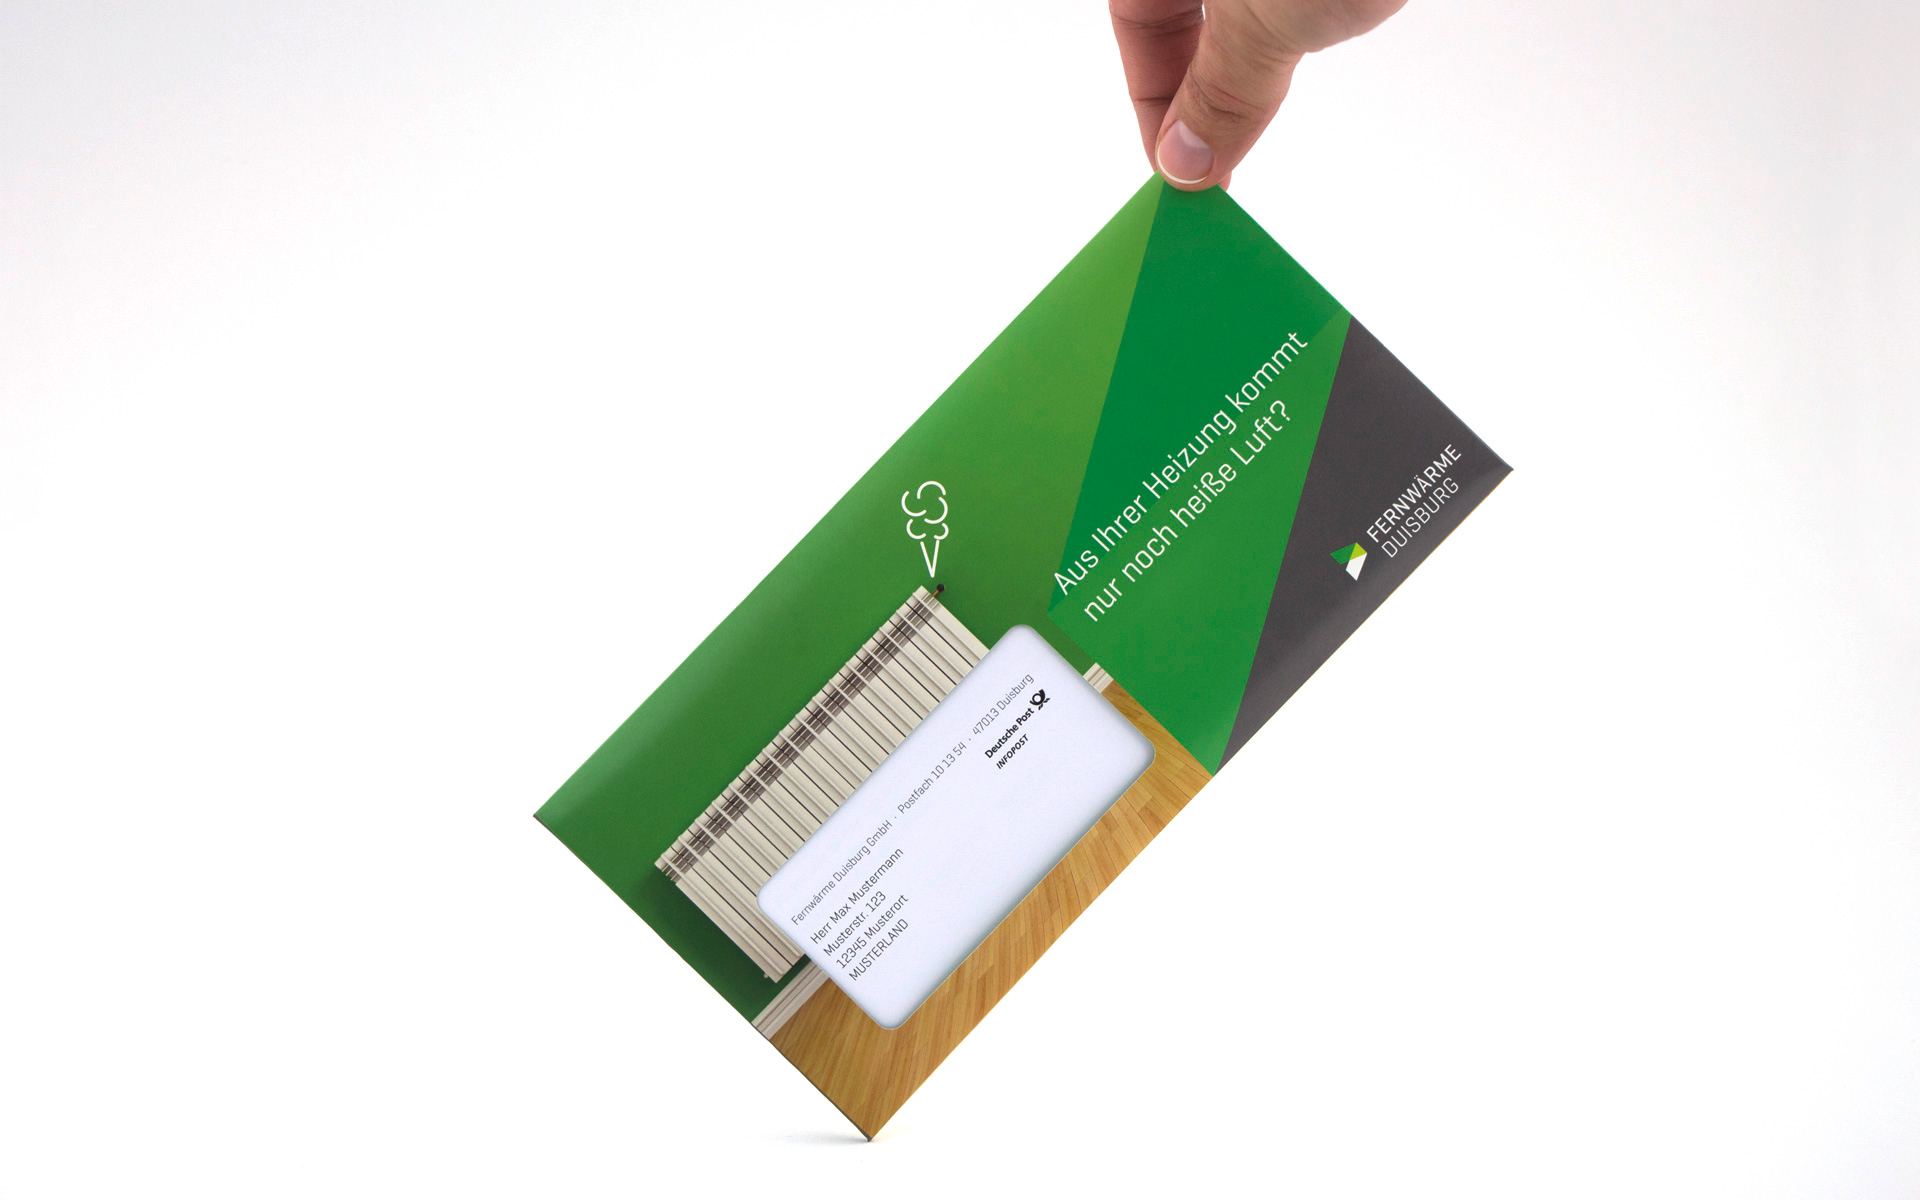 Fernwärme Duisburg GmbH-Mailing